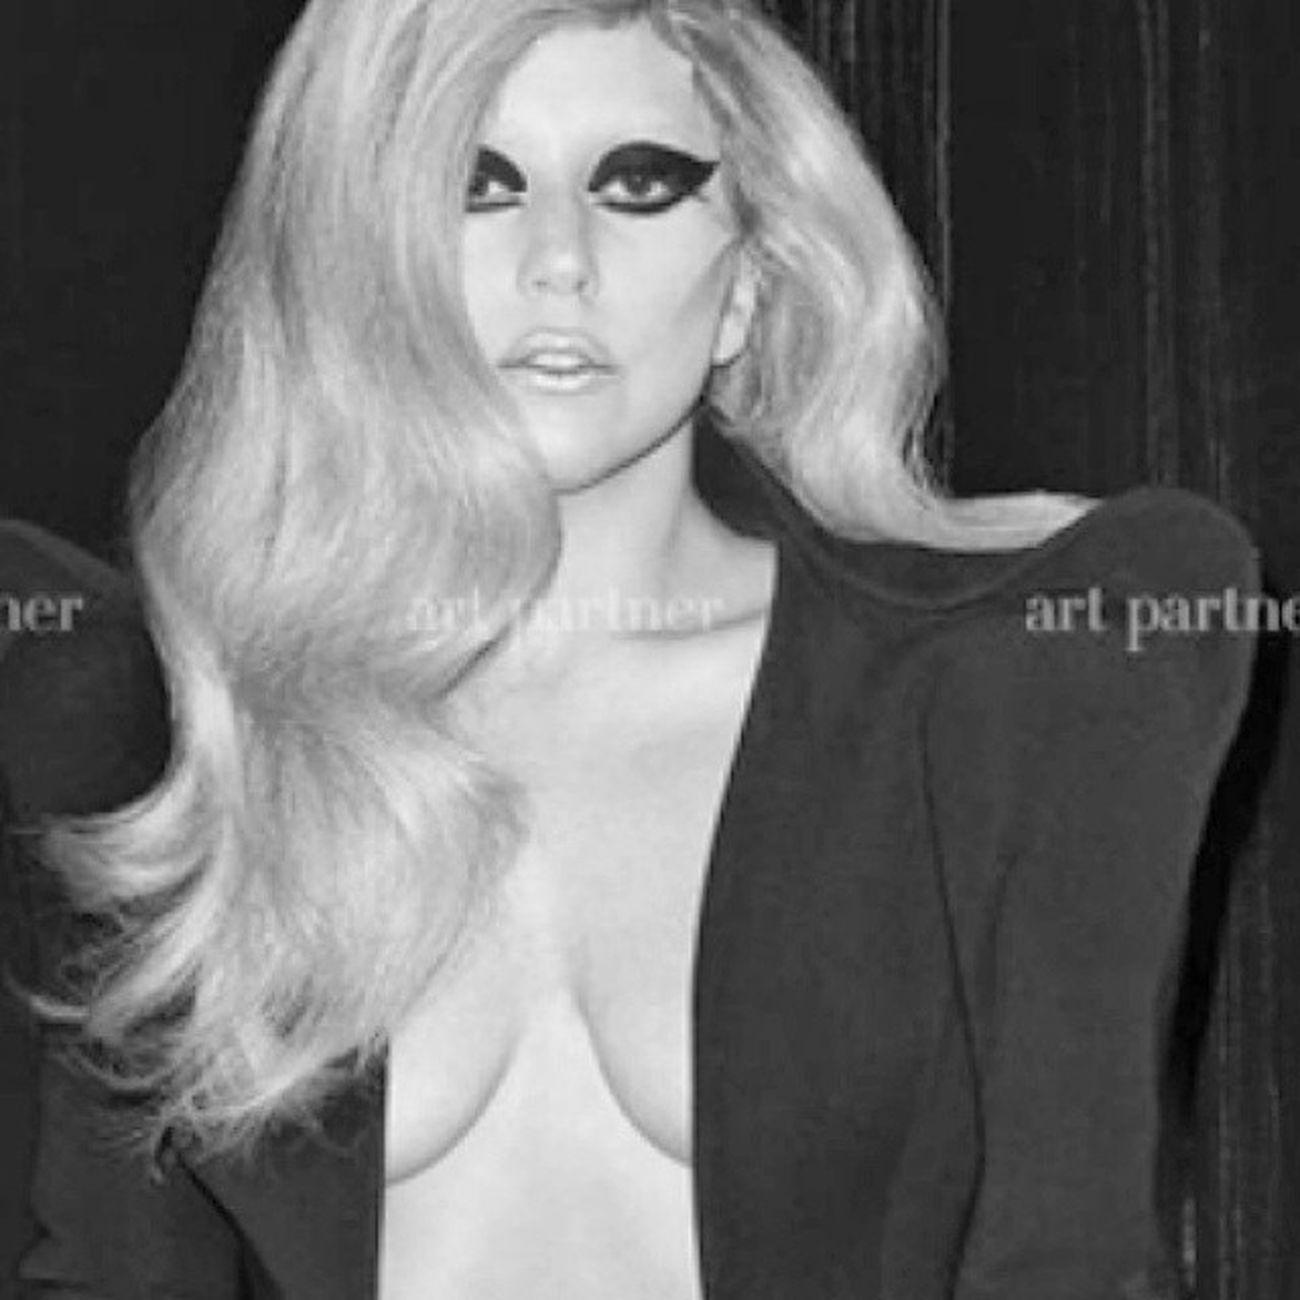 @ladygaga best photoshoot ??? Throwback Bestphotoshoot Ladygaga Gaga instagaga bornthisway mothermonster fashion lovethispic gagaisthebest littlemonsters monsterstyle myqueen queenofmusic